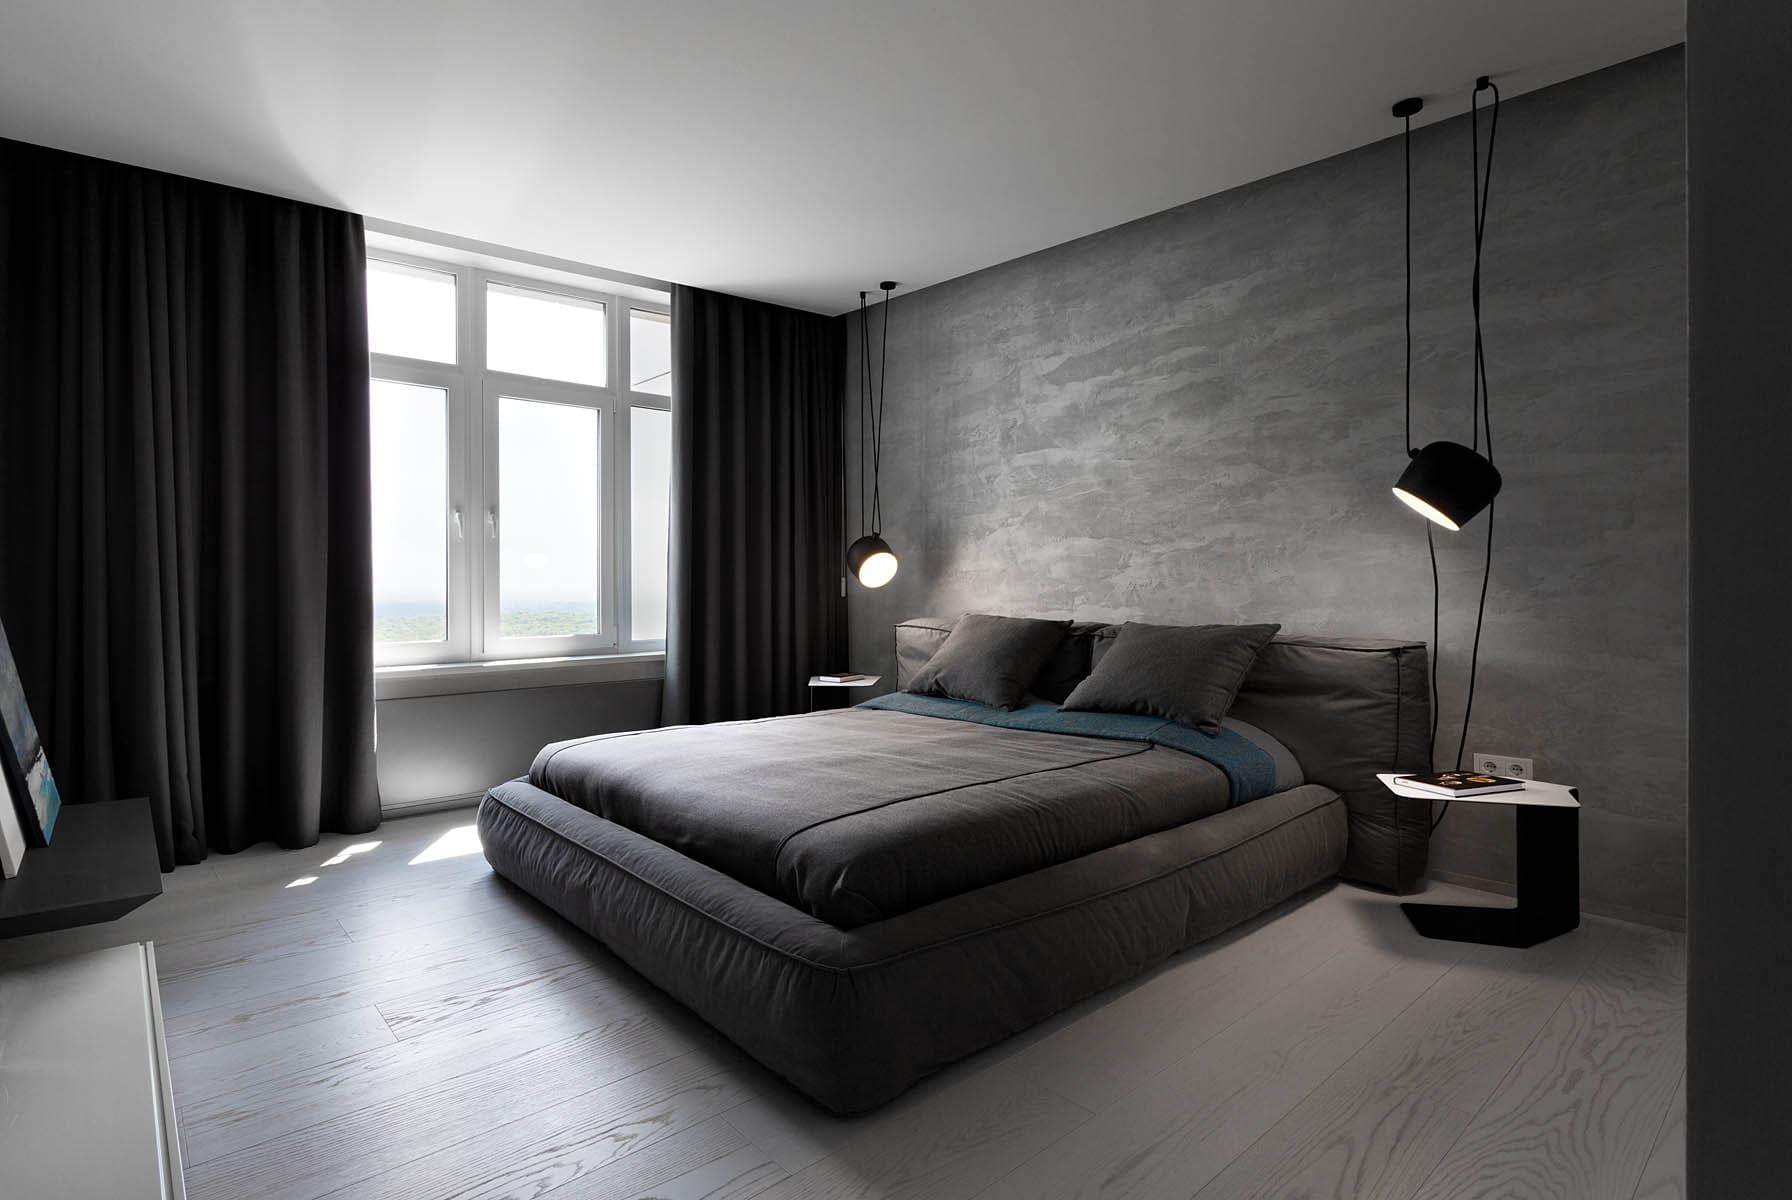 спальня в стиле минимализм фото видов